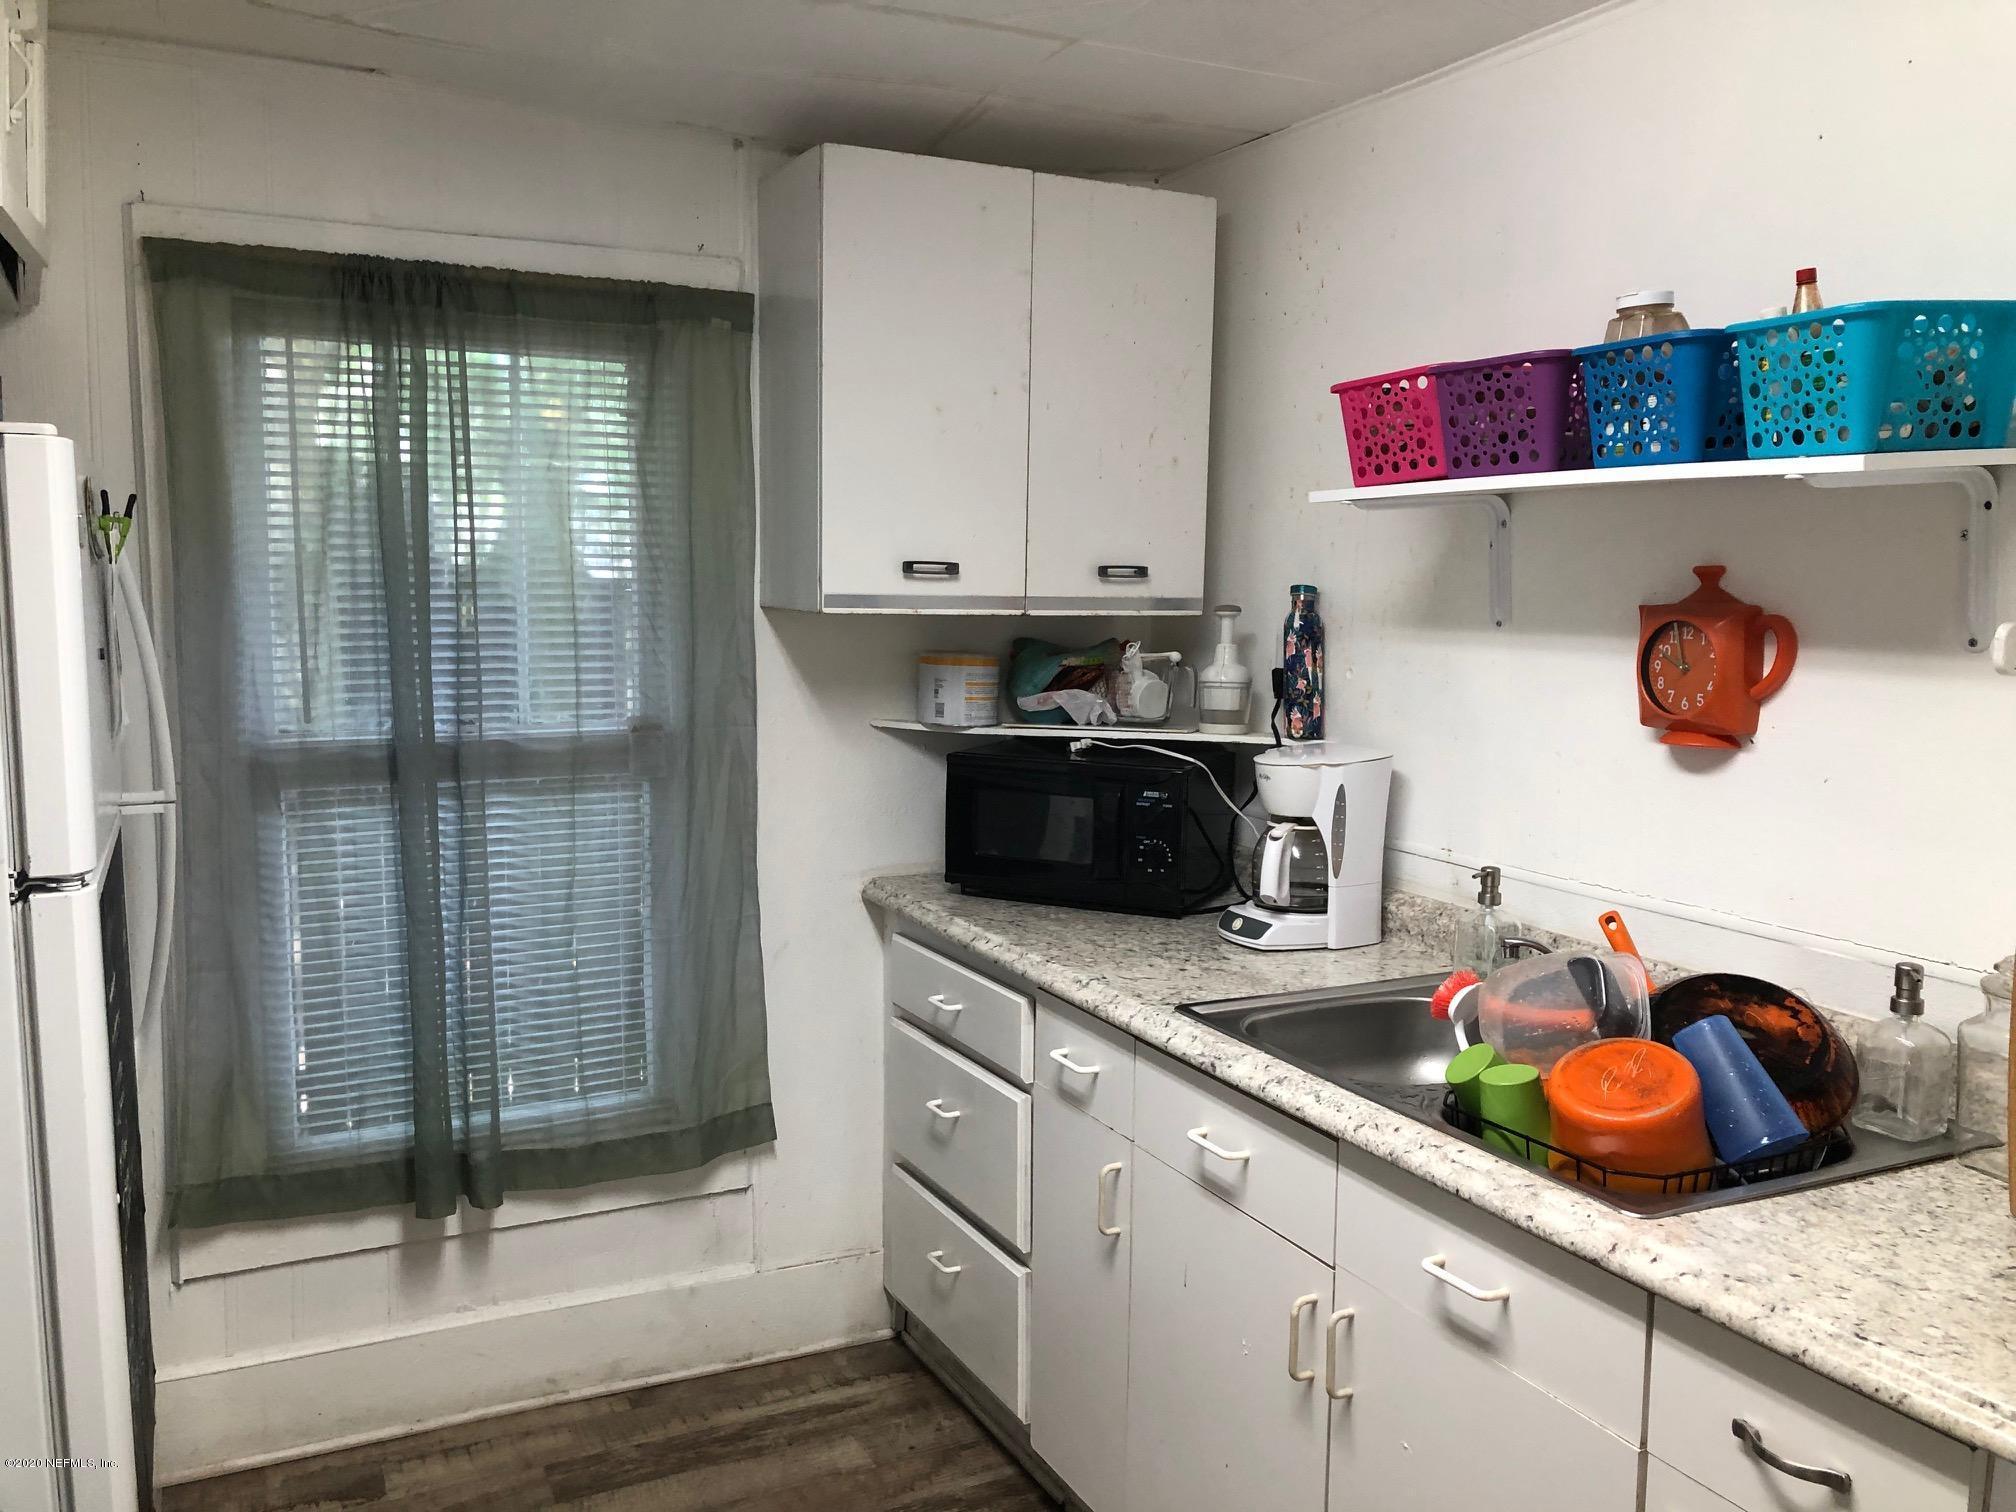 6 MC WILLIAMS, ST AUGUSTINE, FLORIDA 32084, 2 Bedrooms Bedrooms, ,1 BathroomBathrooms,Residential,For sale,MC WILLIAMS,1058861